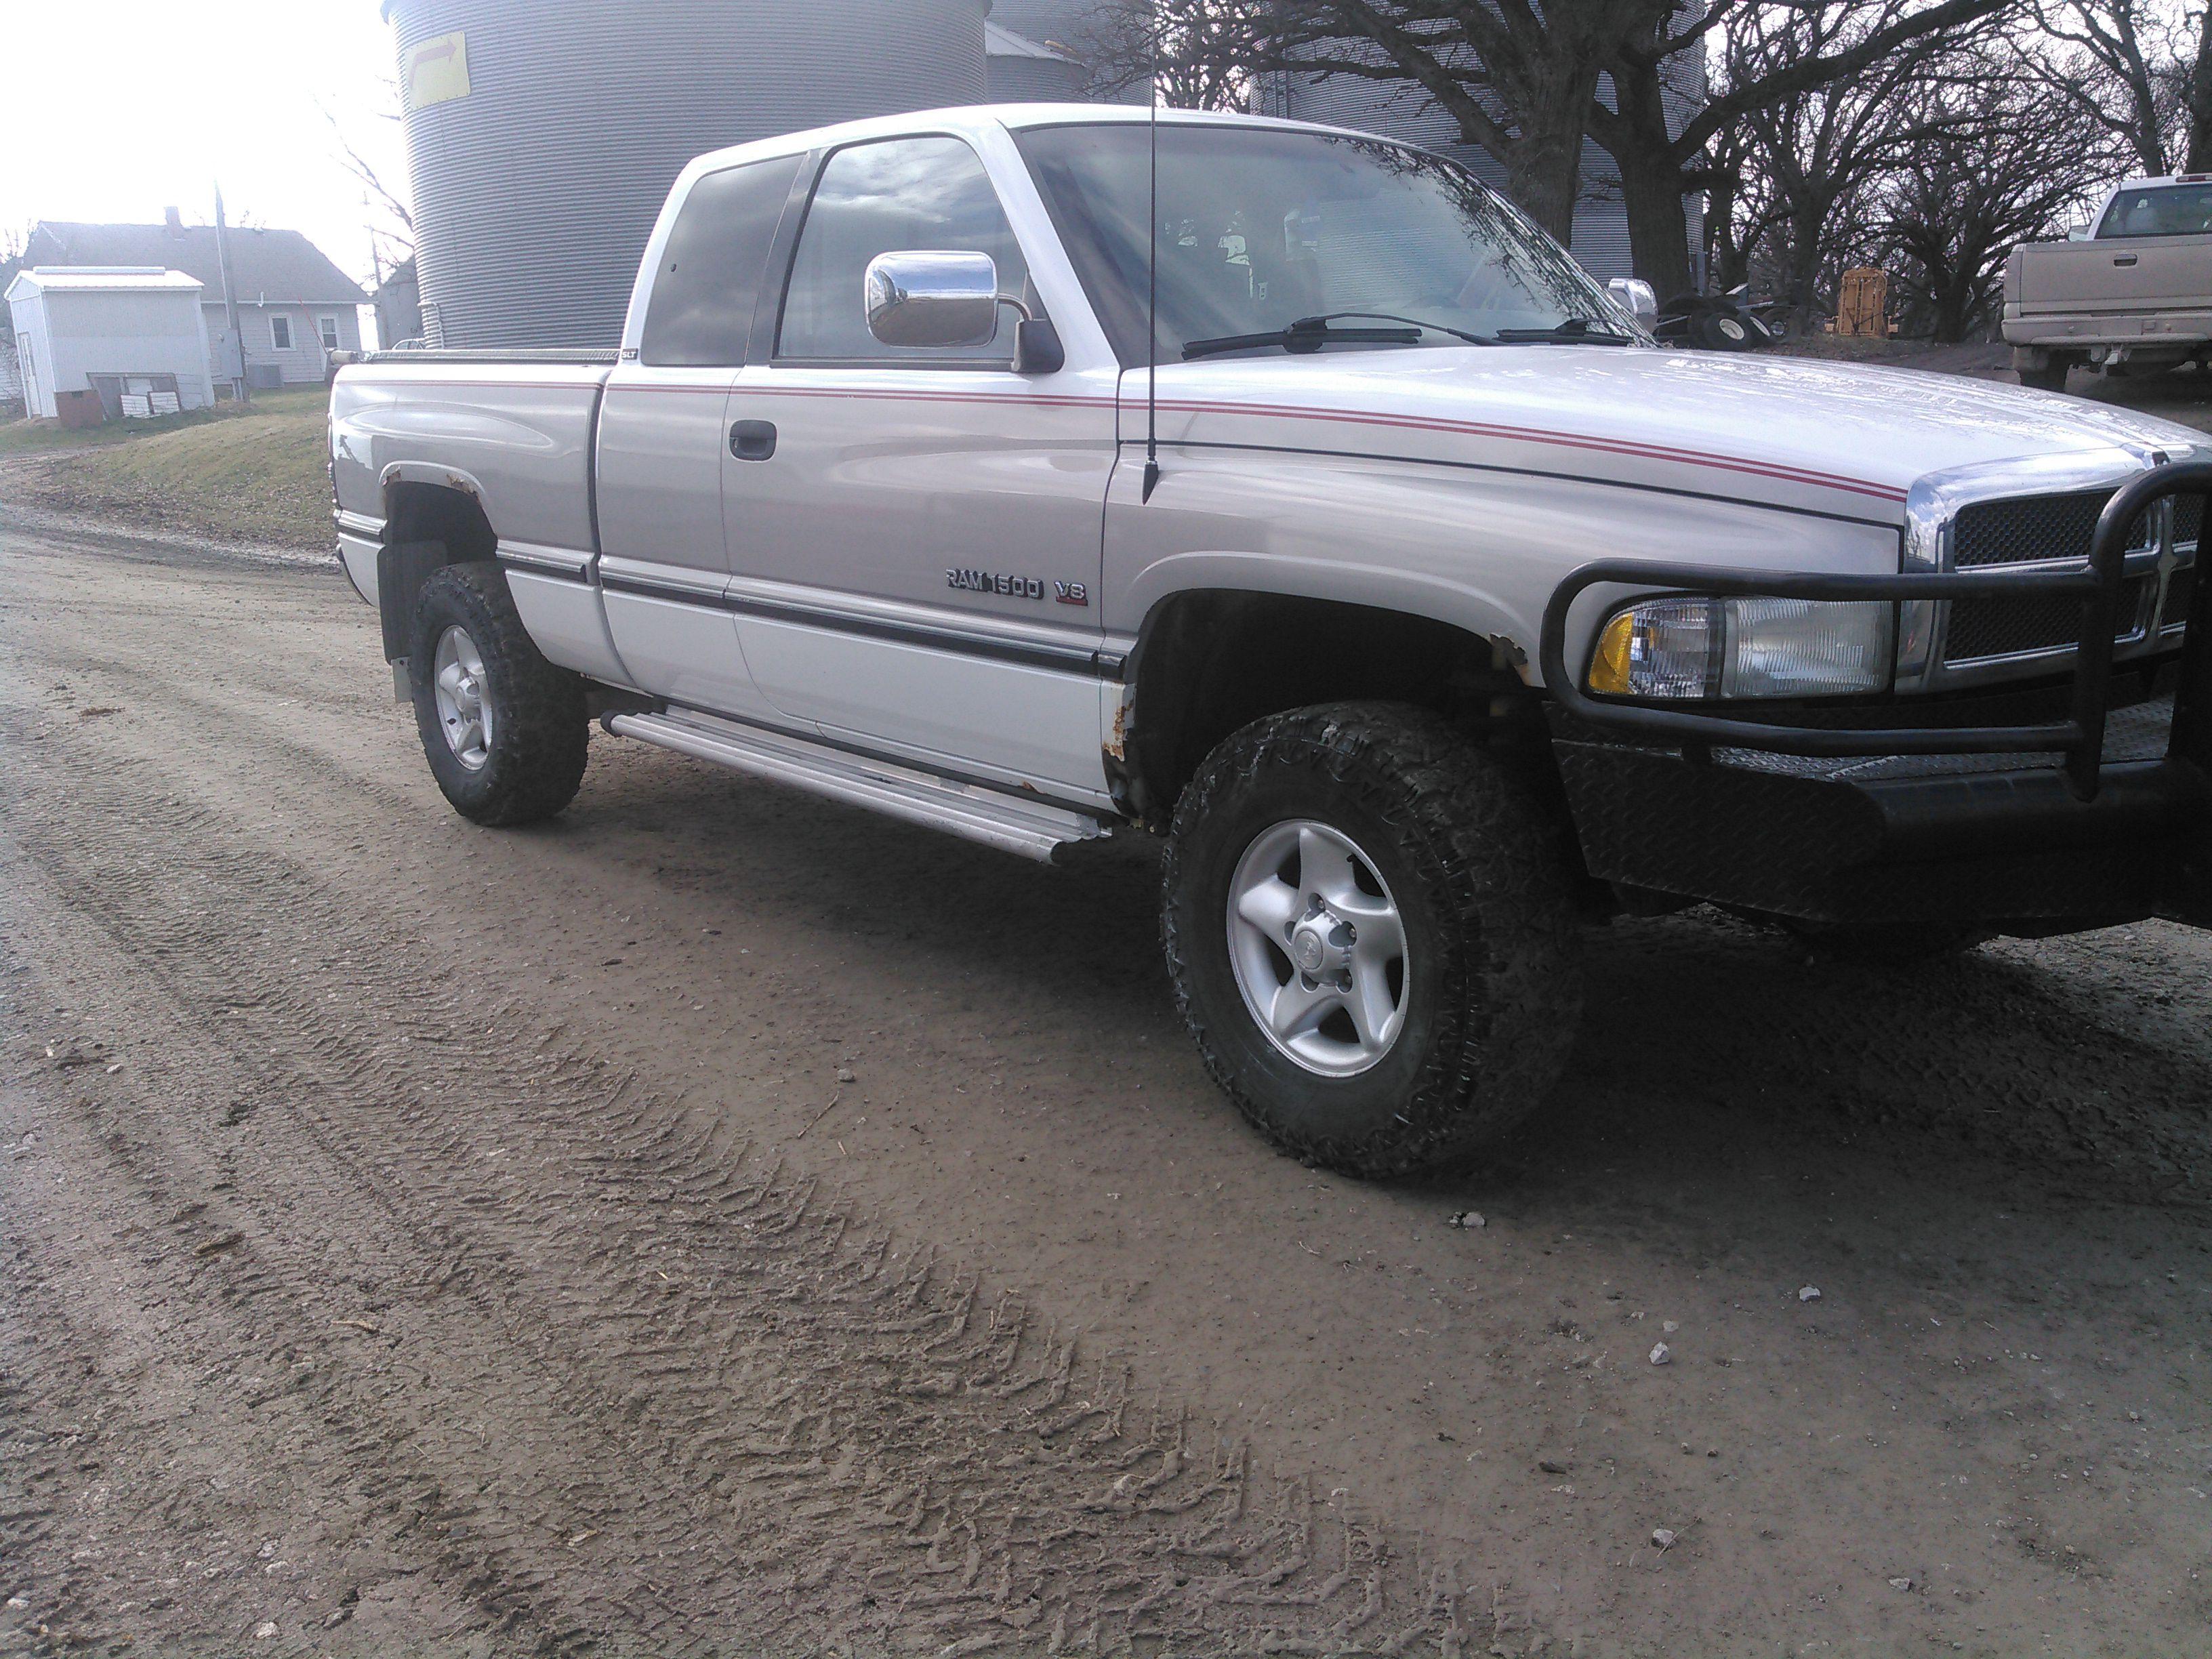 1997 Dodge 1500 4x4 image 1